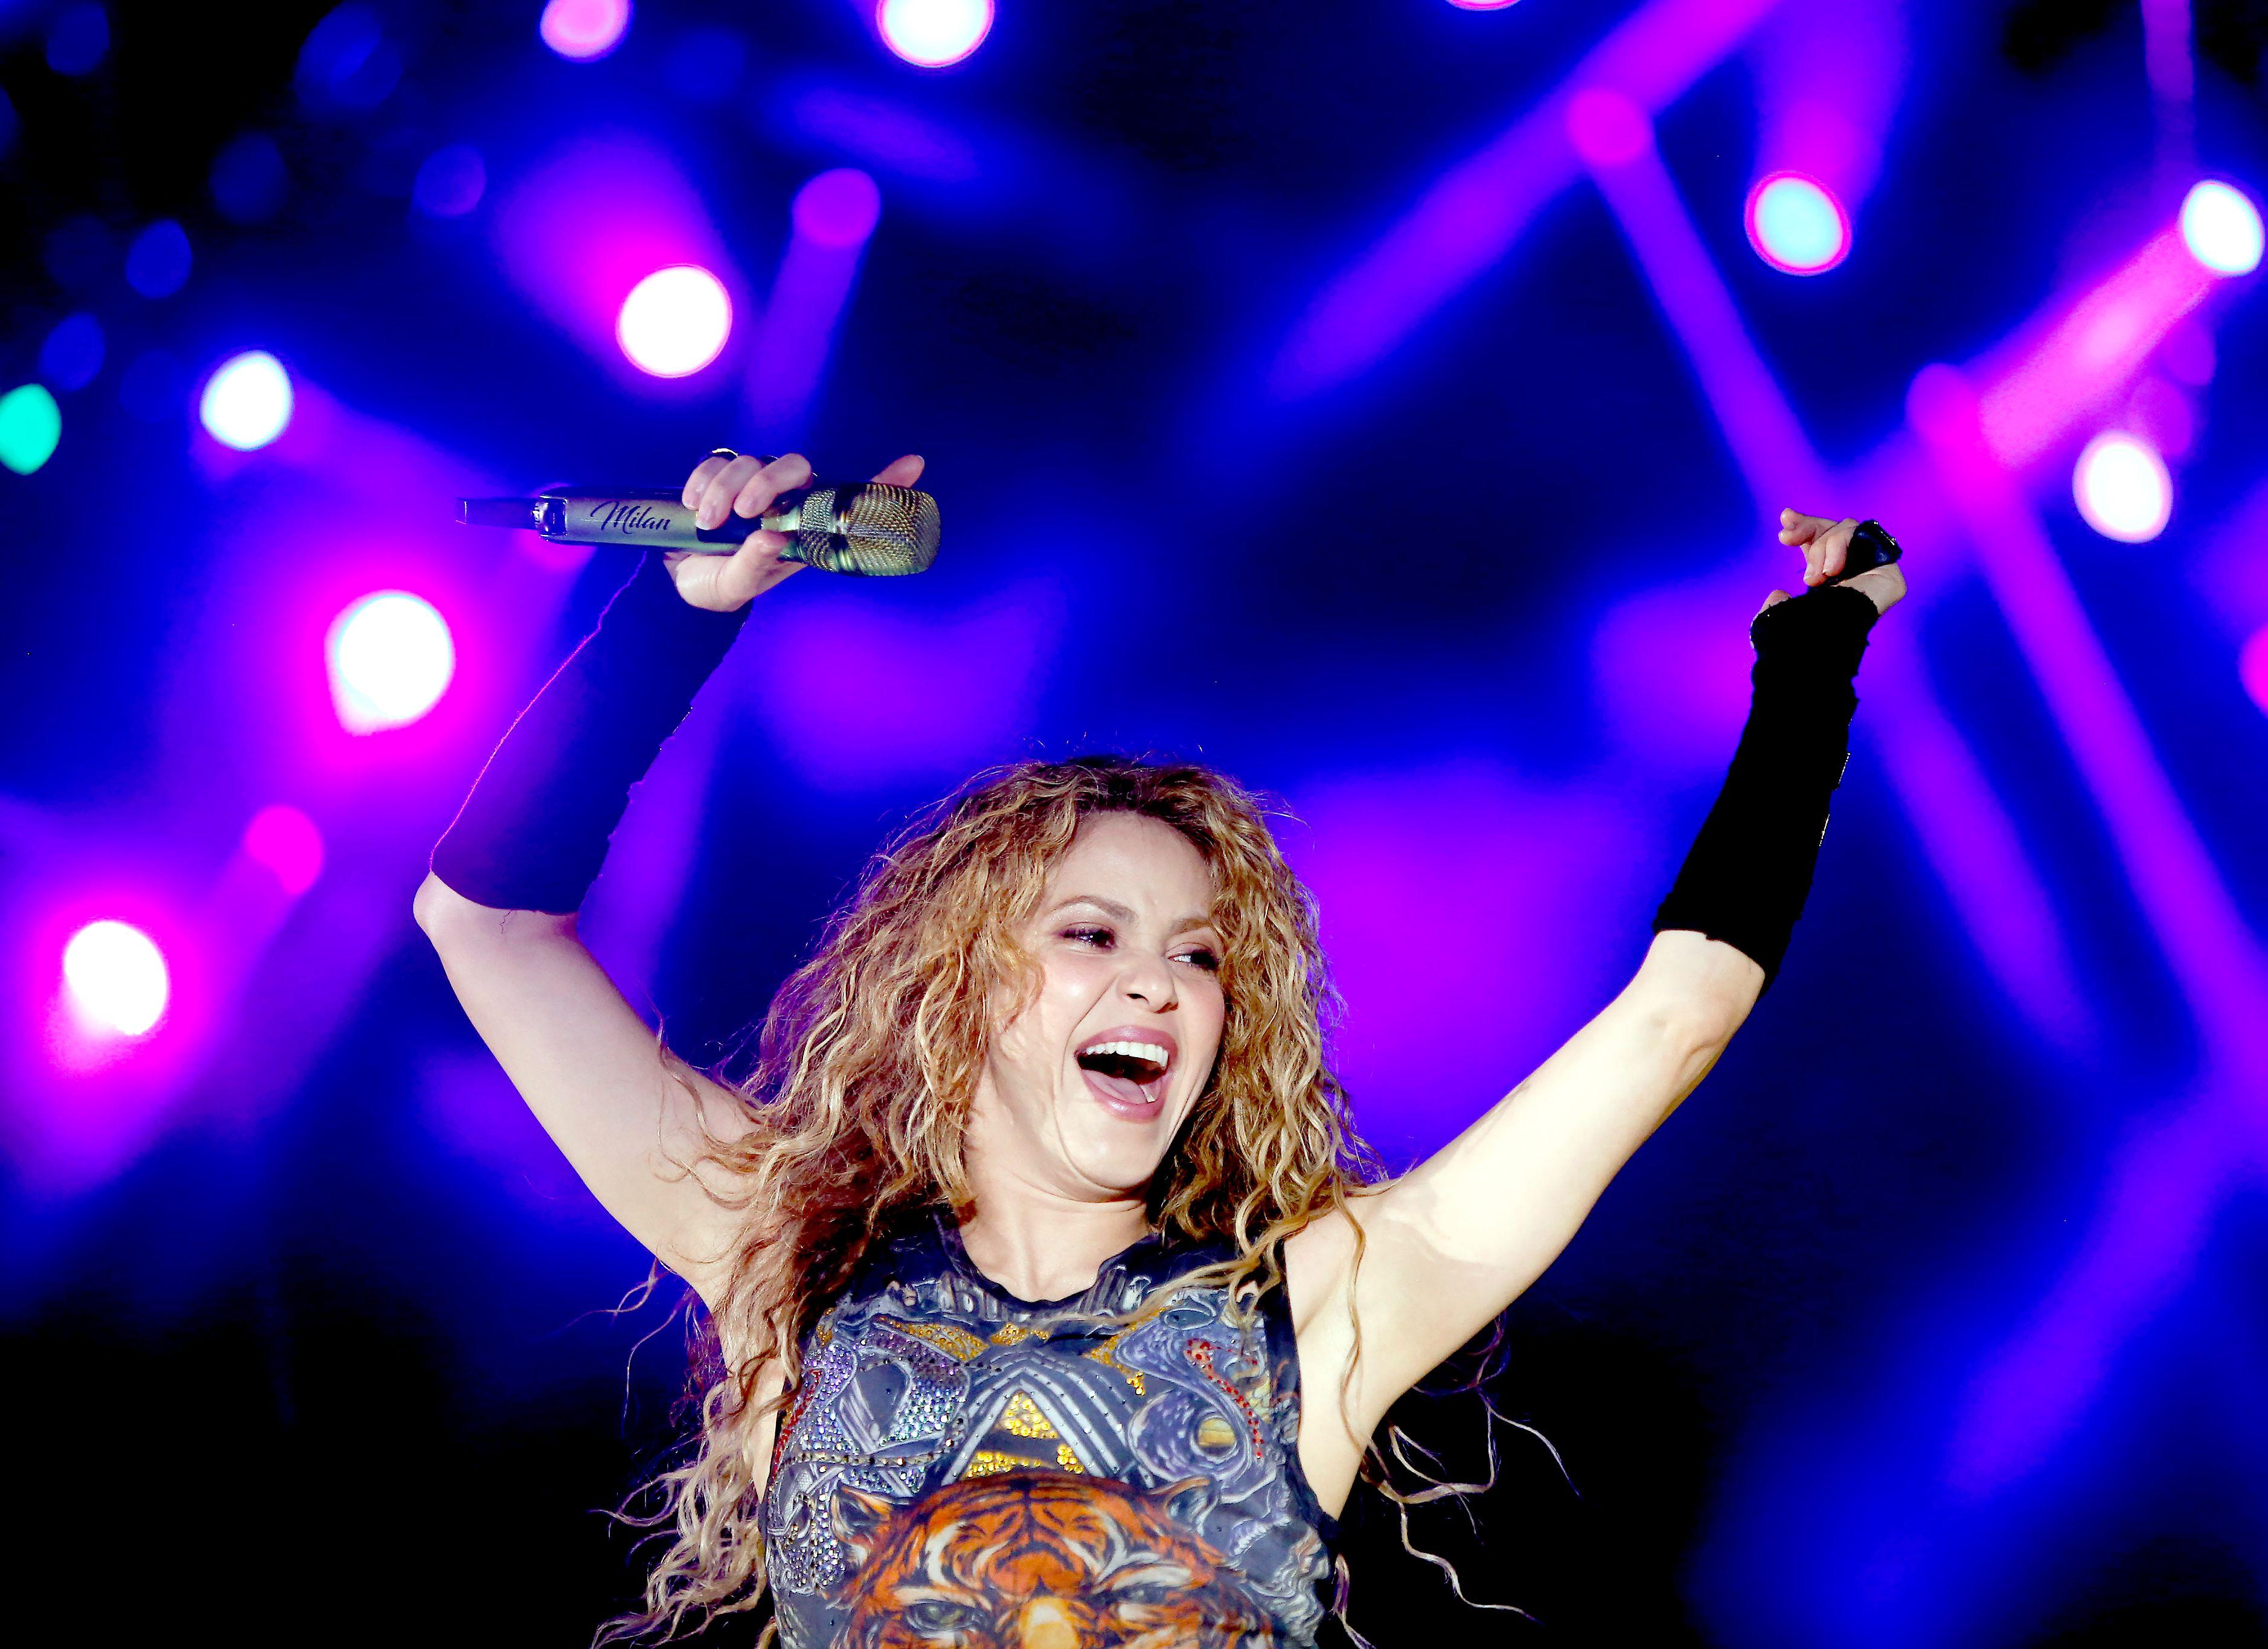 ShakiraShakira in concert, Cedars, Lebanon - 13 Jul 2018Colombian singer Shakira performs on stage during a concert at the Cedars International Festival 2018 at the Cedars mountain, northeastern Lebanon, 13 July 2018.